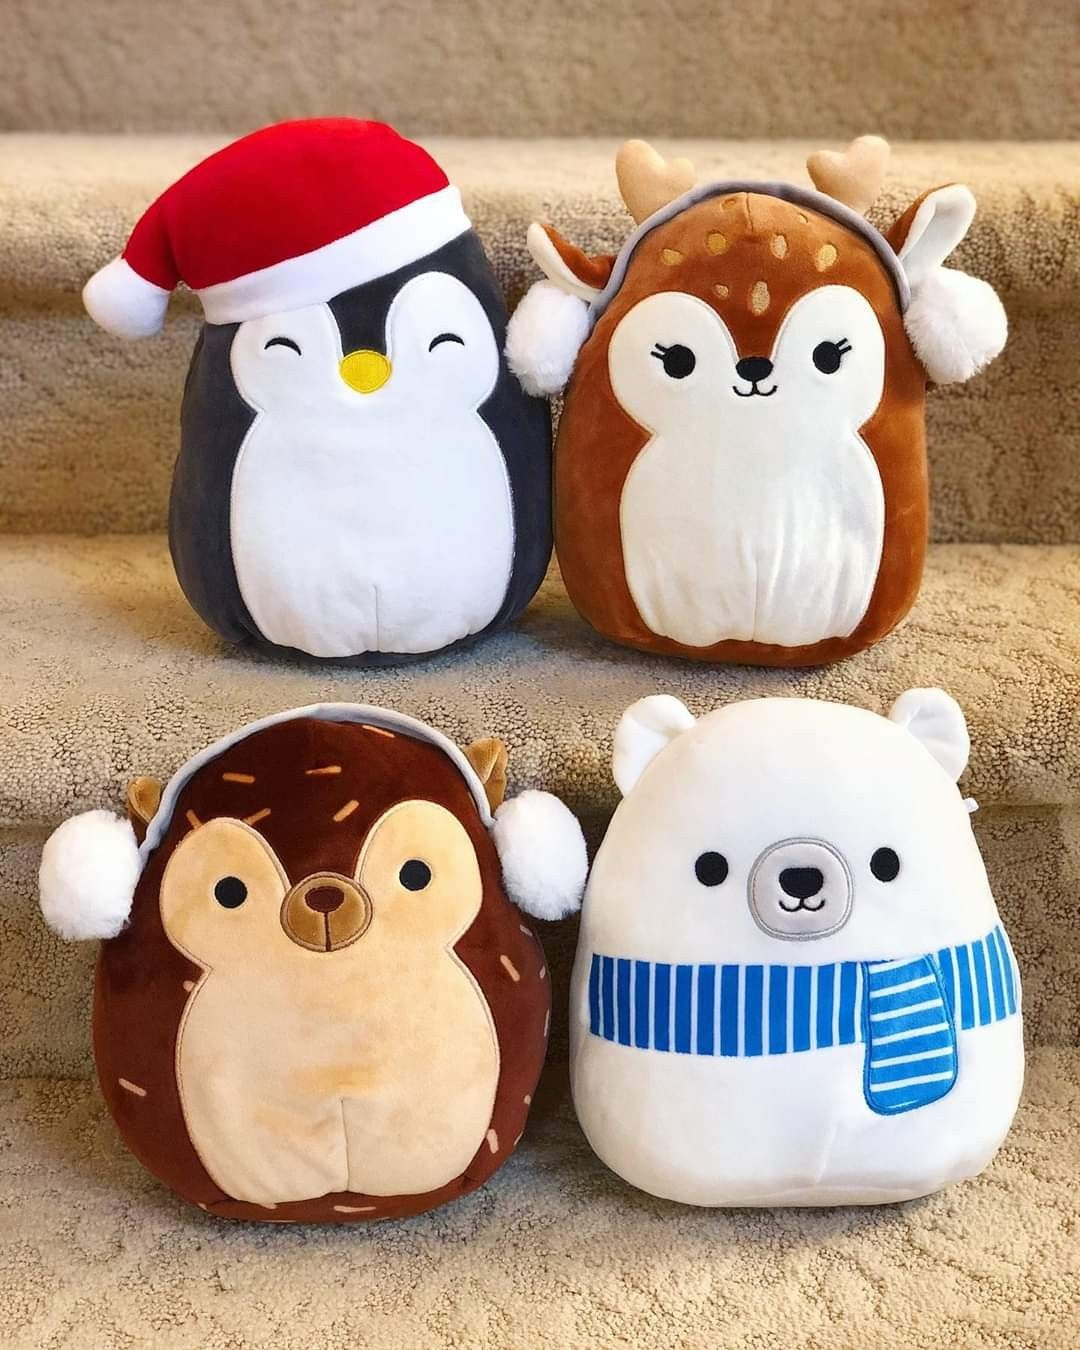 Squishmallows From Five Below Cute Stuffed Animals Cute Plush Plush Animals